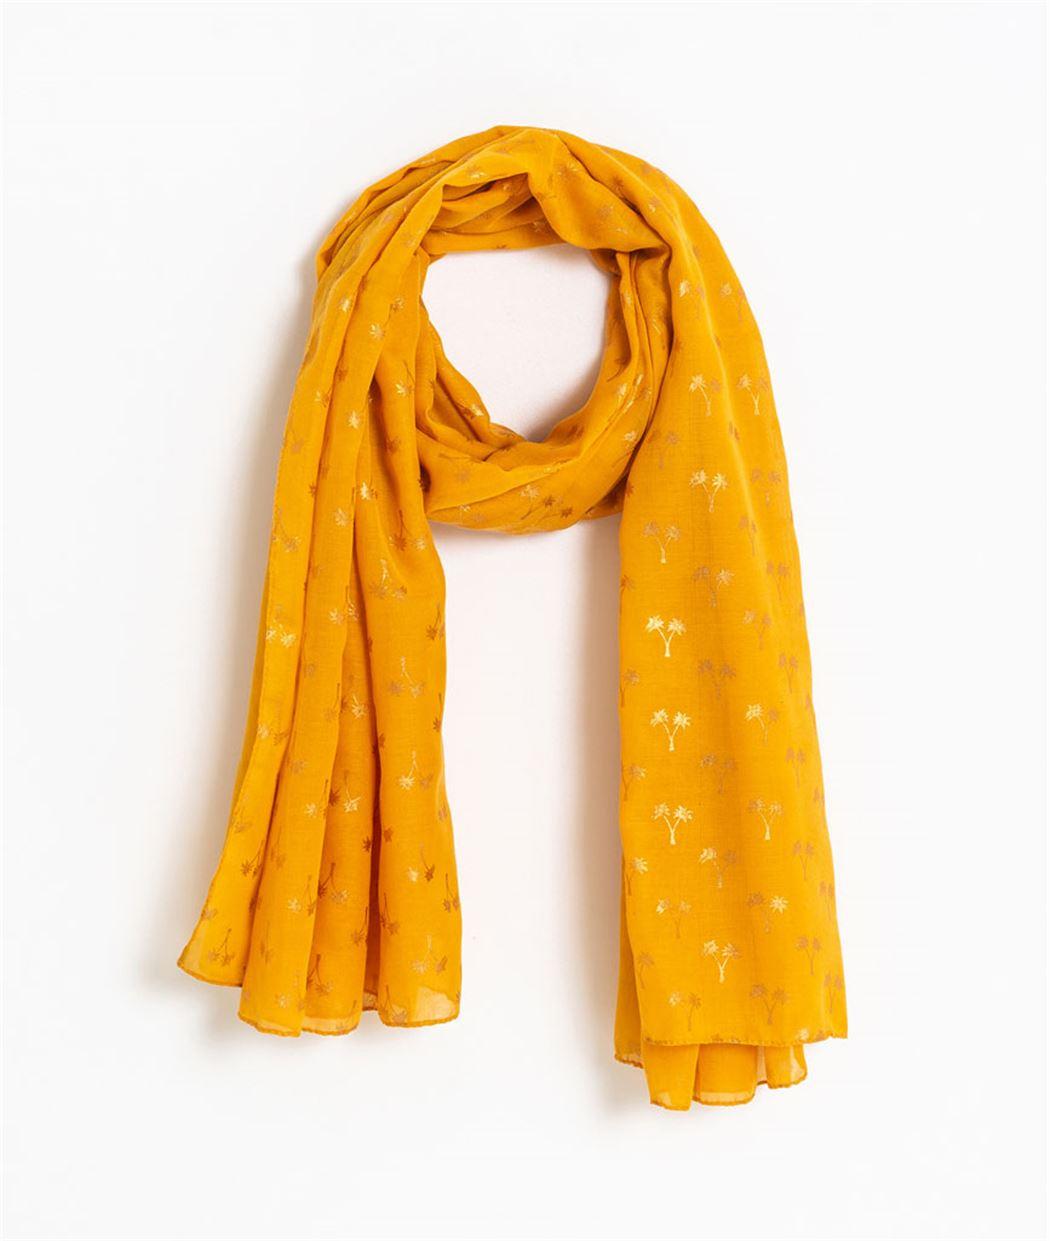 2f8118c8b15c8 Foulard femme jaune motif palmiers JAUNE - Grain de Malice